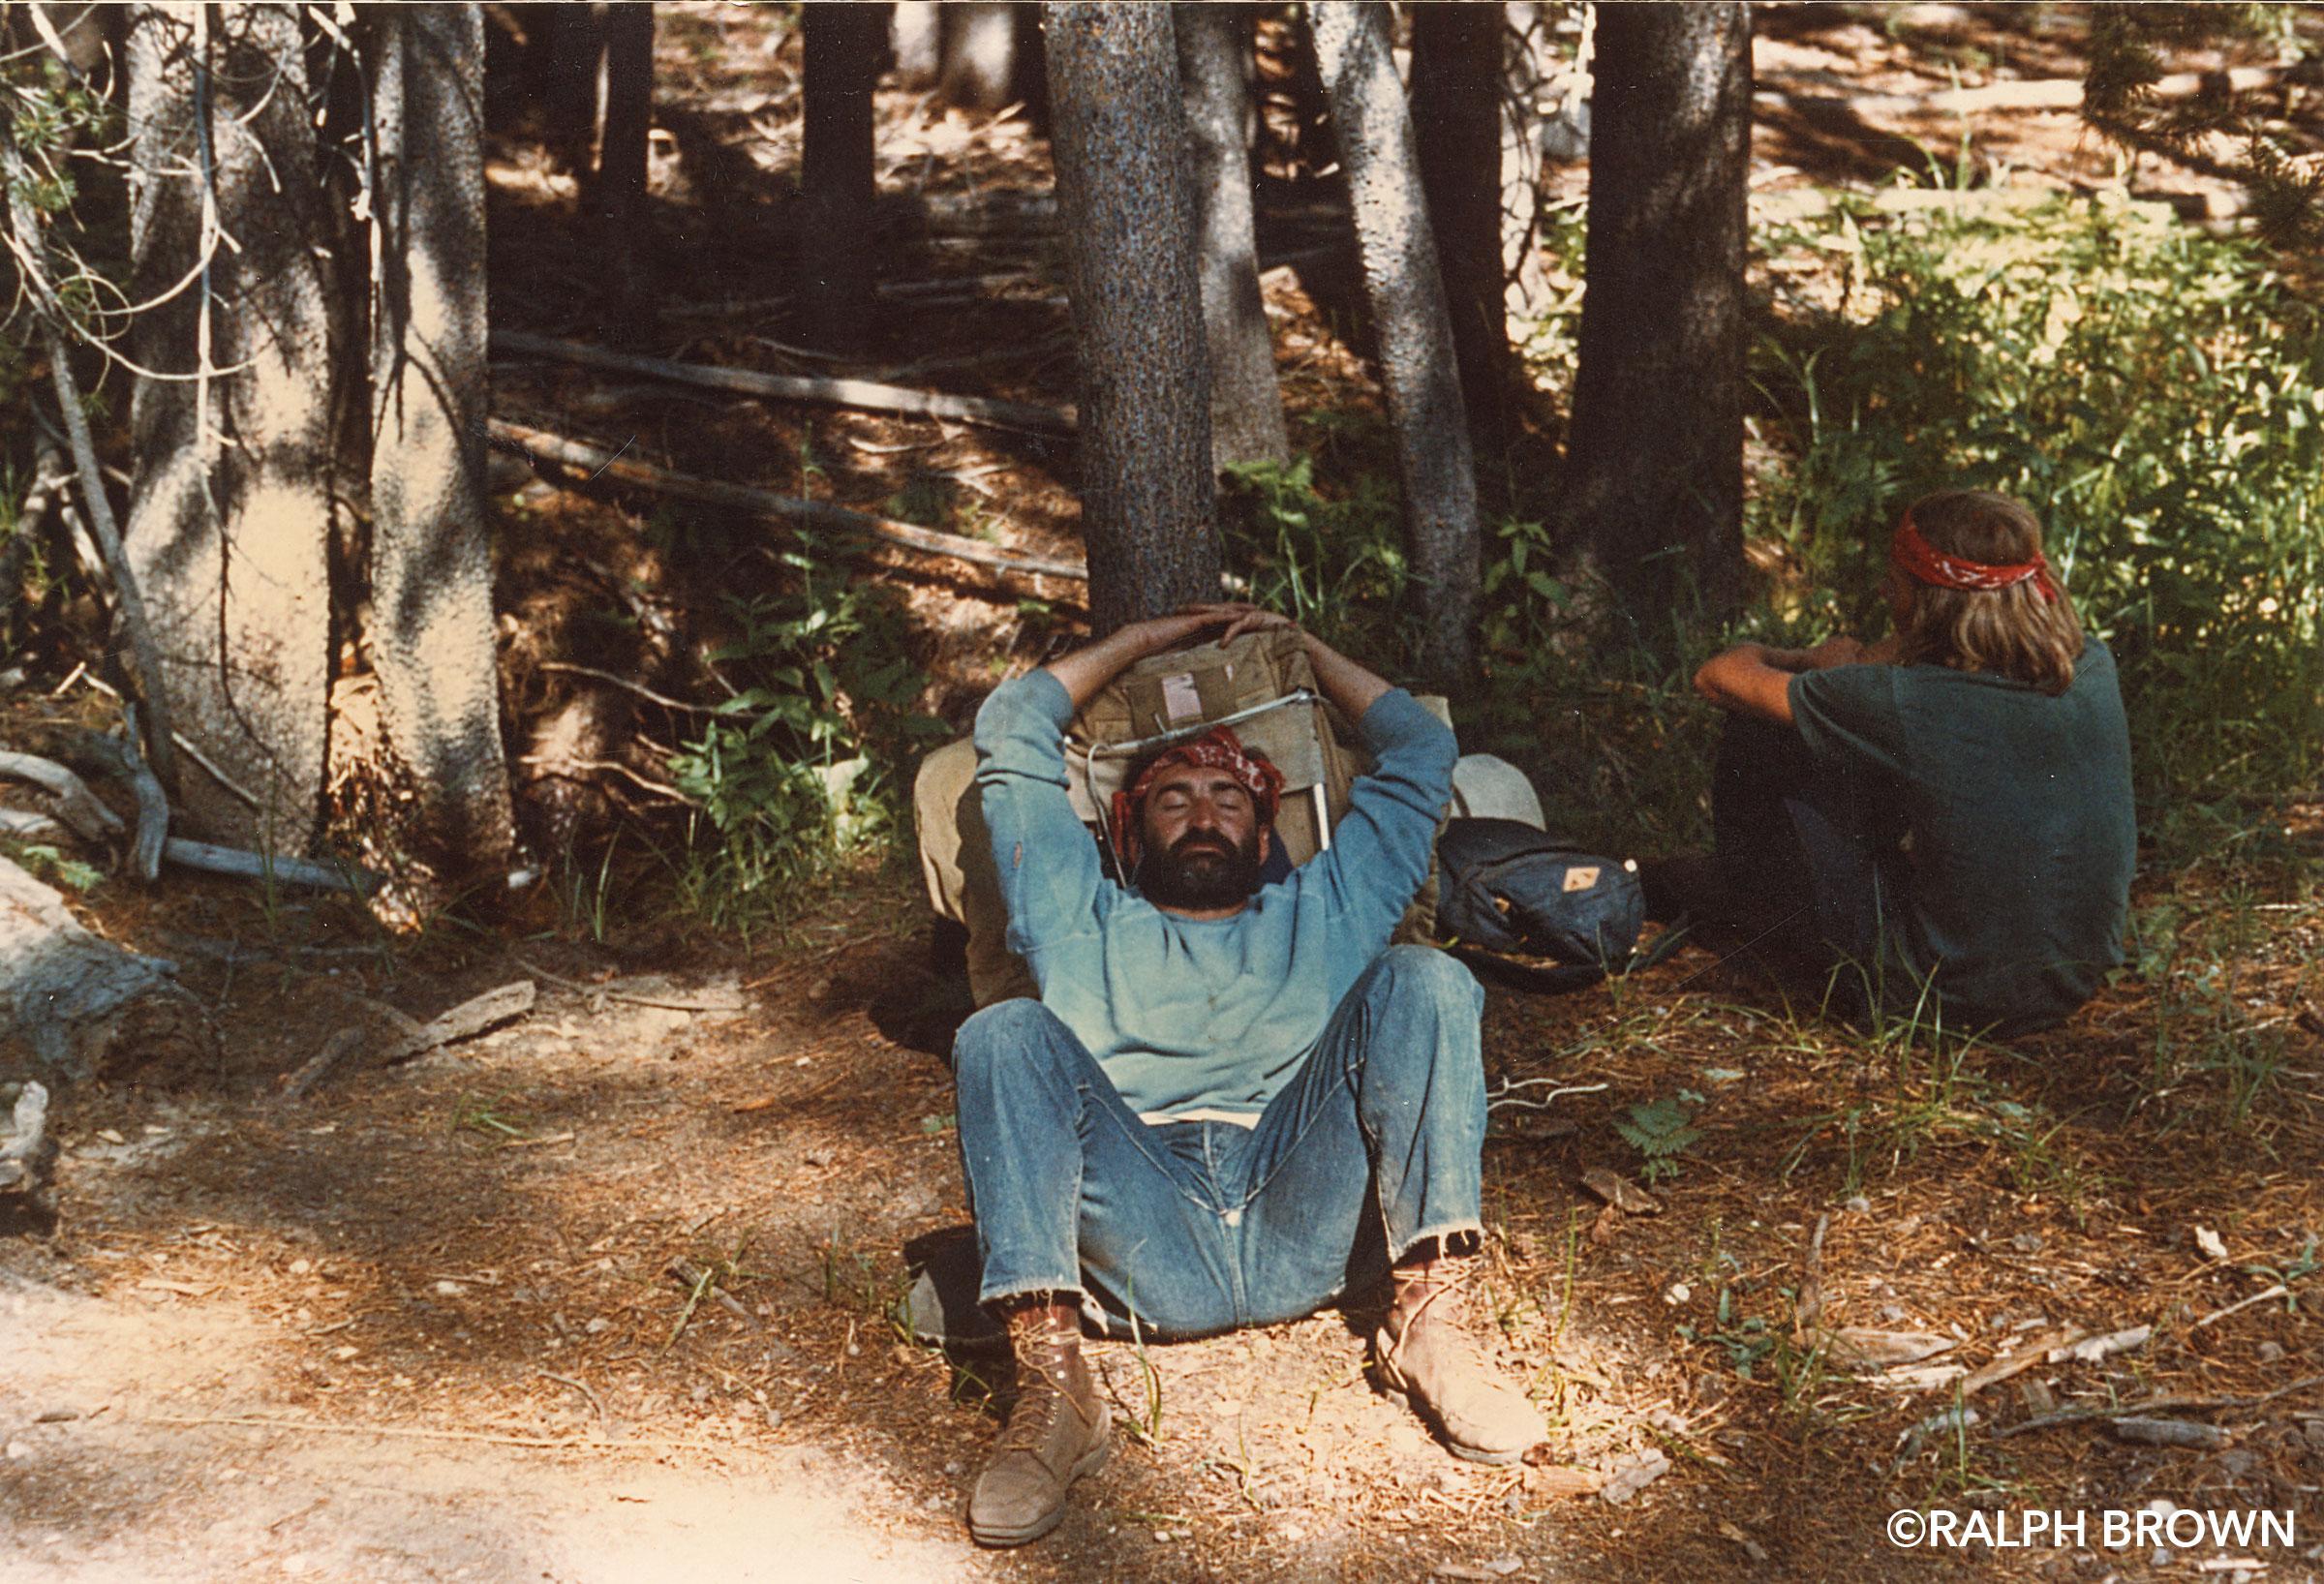 Trail crew getaway. Near Vogelsang High Sierra Camp. Yosemite National Park, California. (L to R): Donald Samuel, Shelley Evans, Jack Knieriemen, and Larry Roberts. Image by Ralph Brown. Summer, 1973.